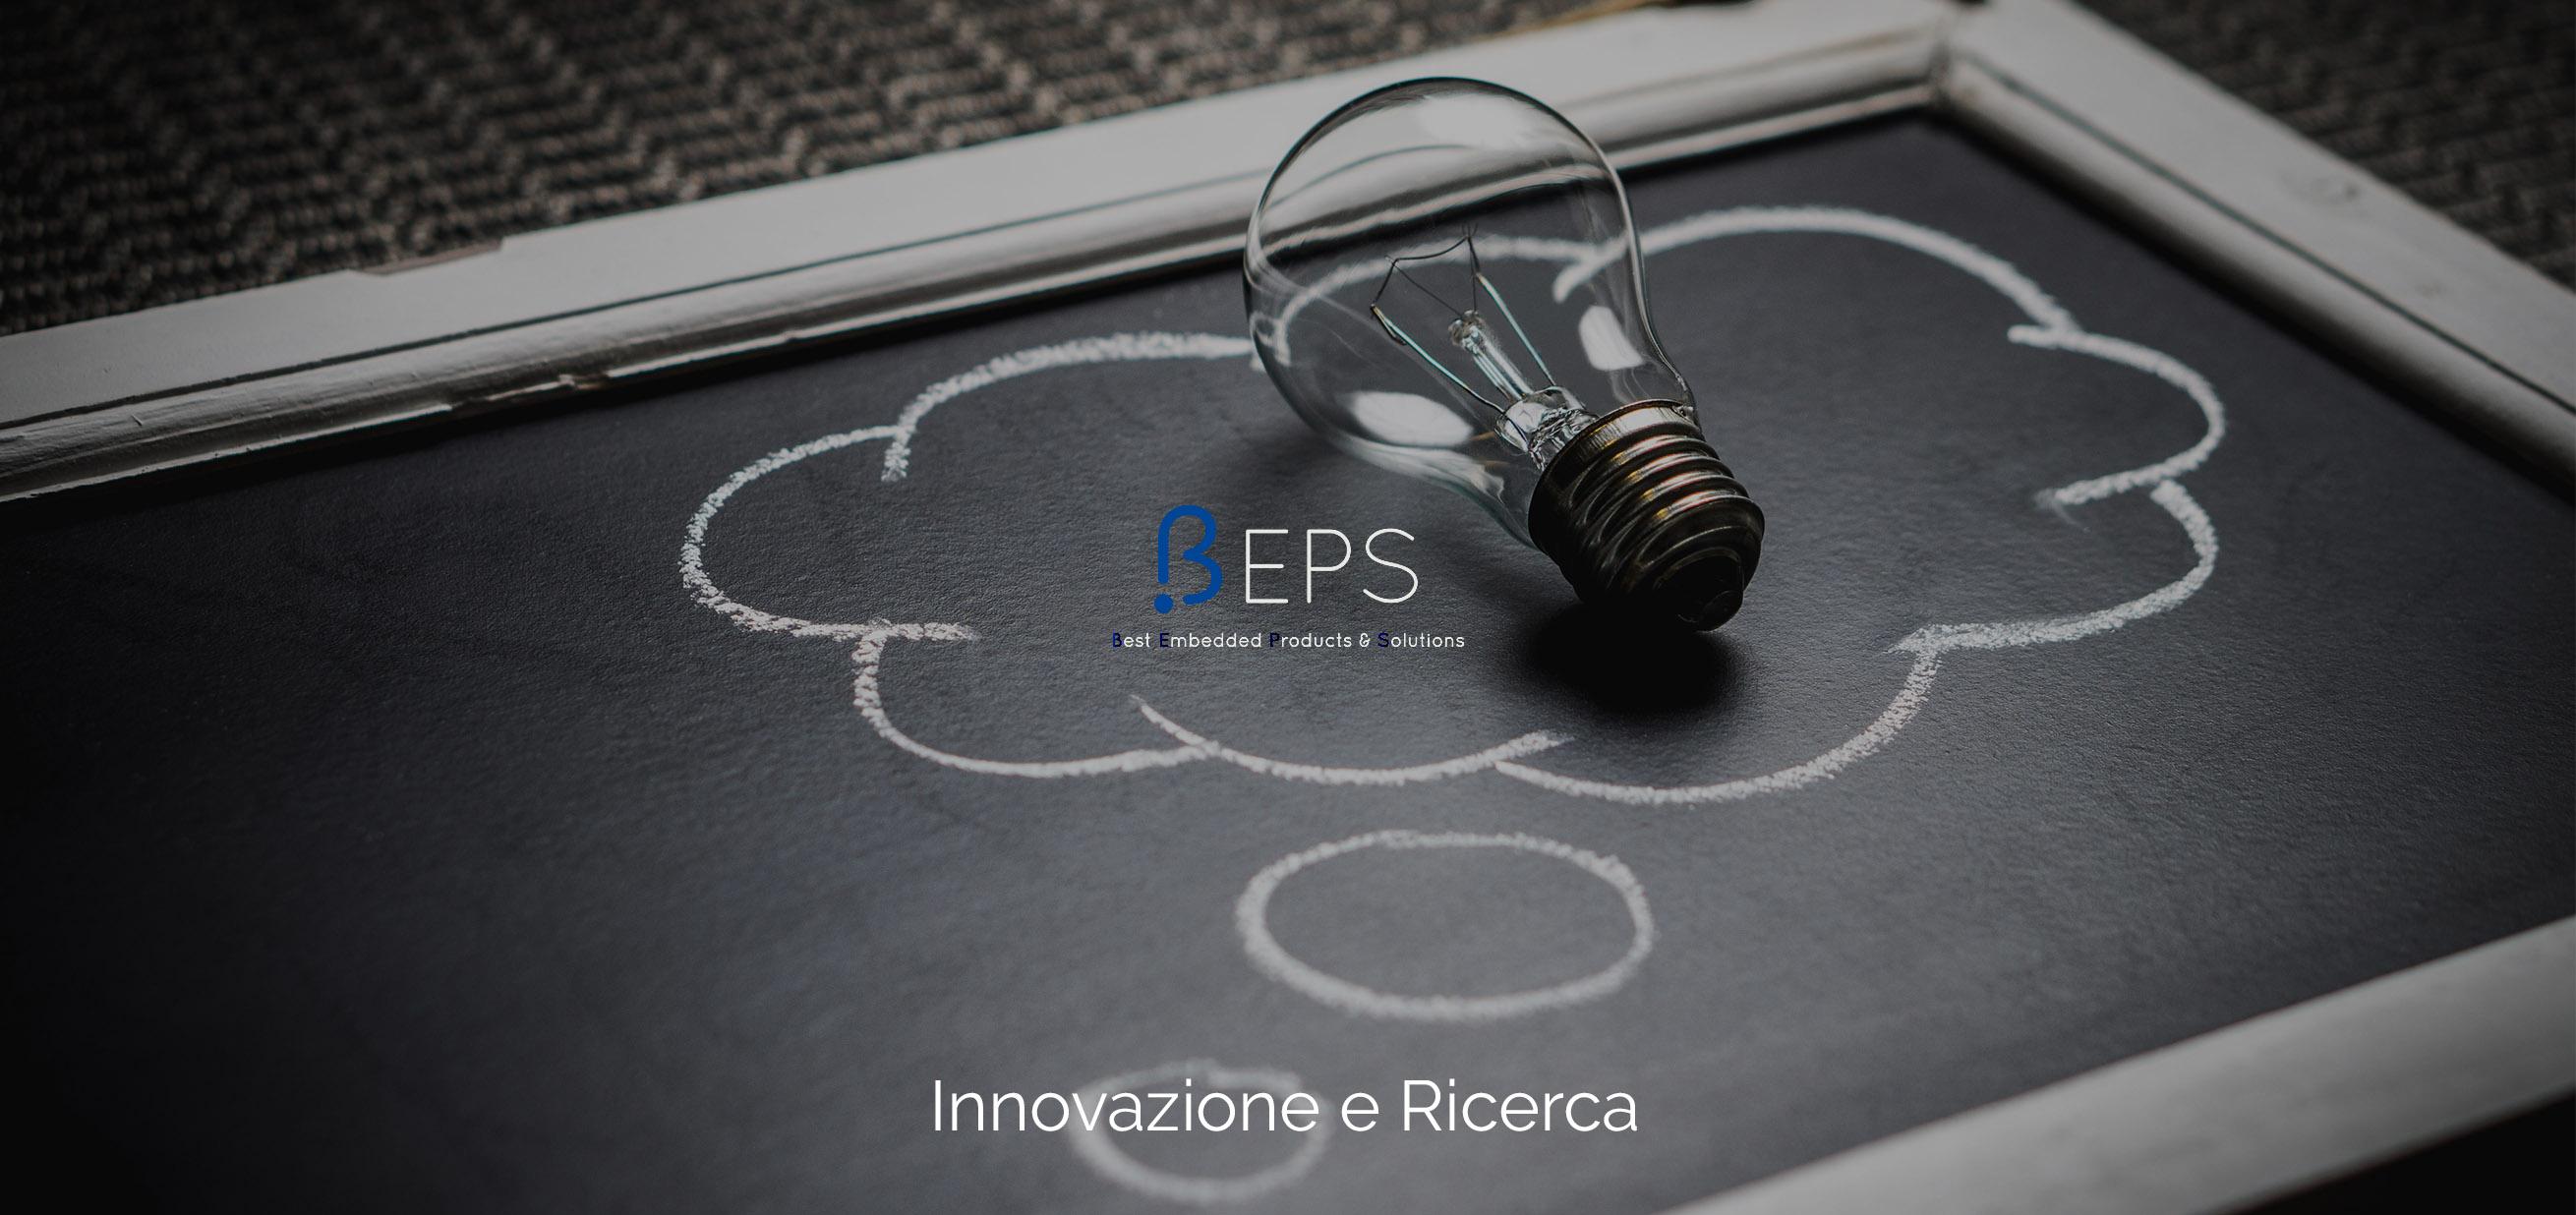 Beps Innovazione Ricerca Bandi IoT Embedded